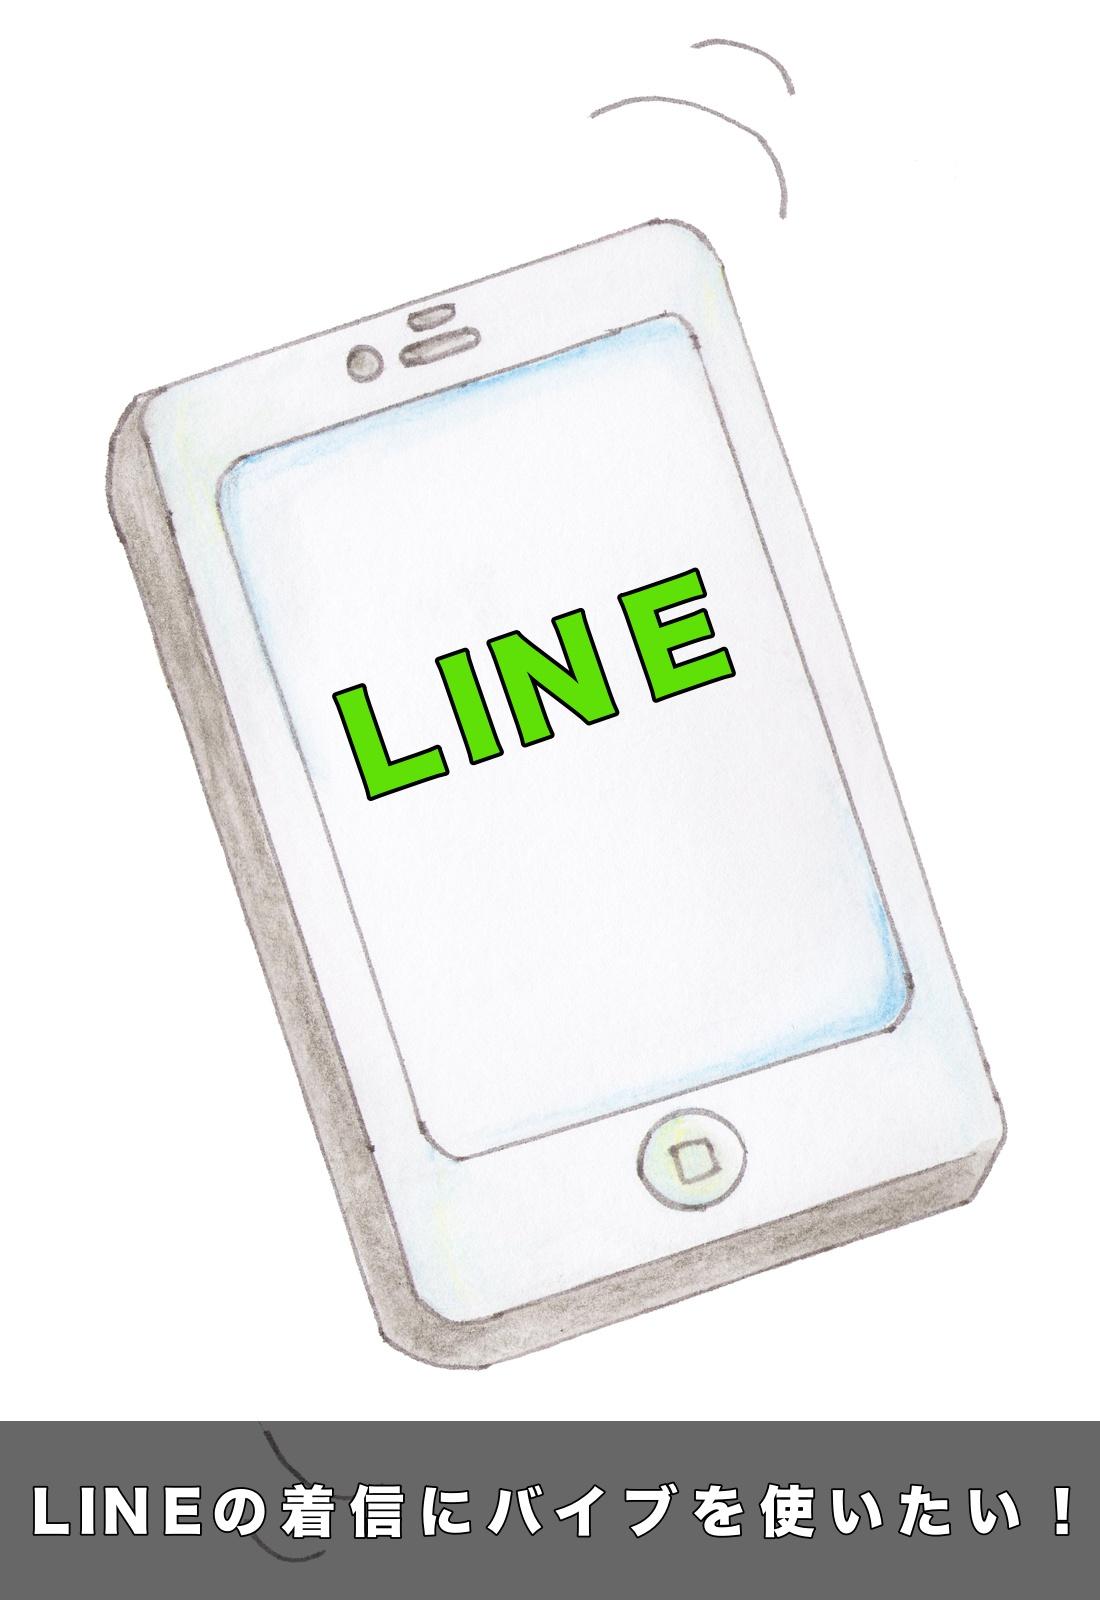 LINEの着信にバイブレーションを使うには?バイブのみにも出来る?